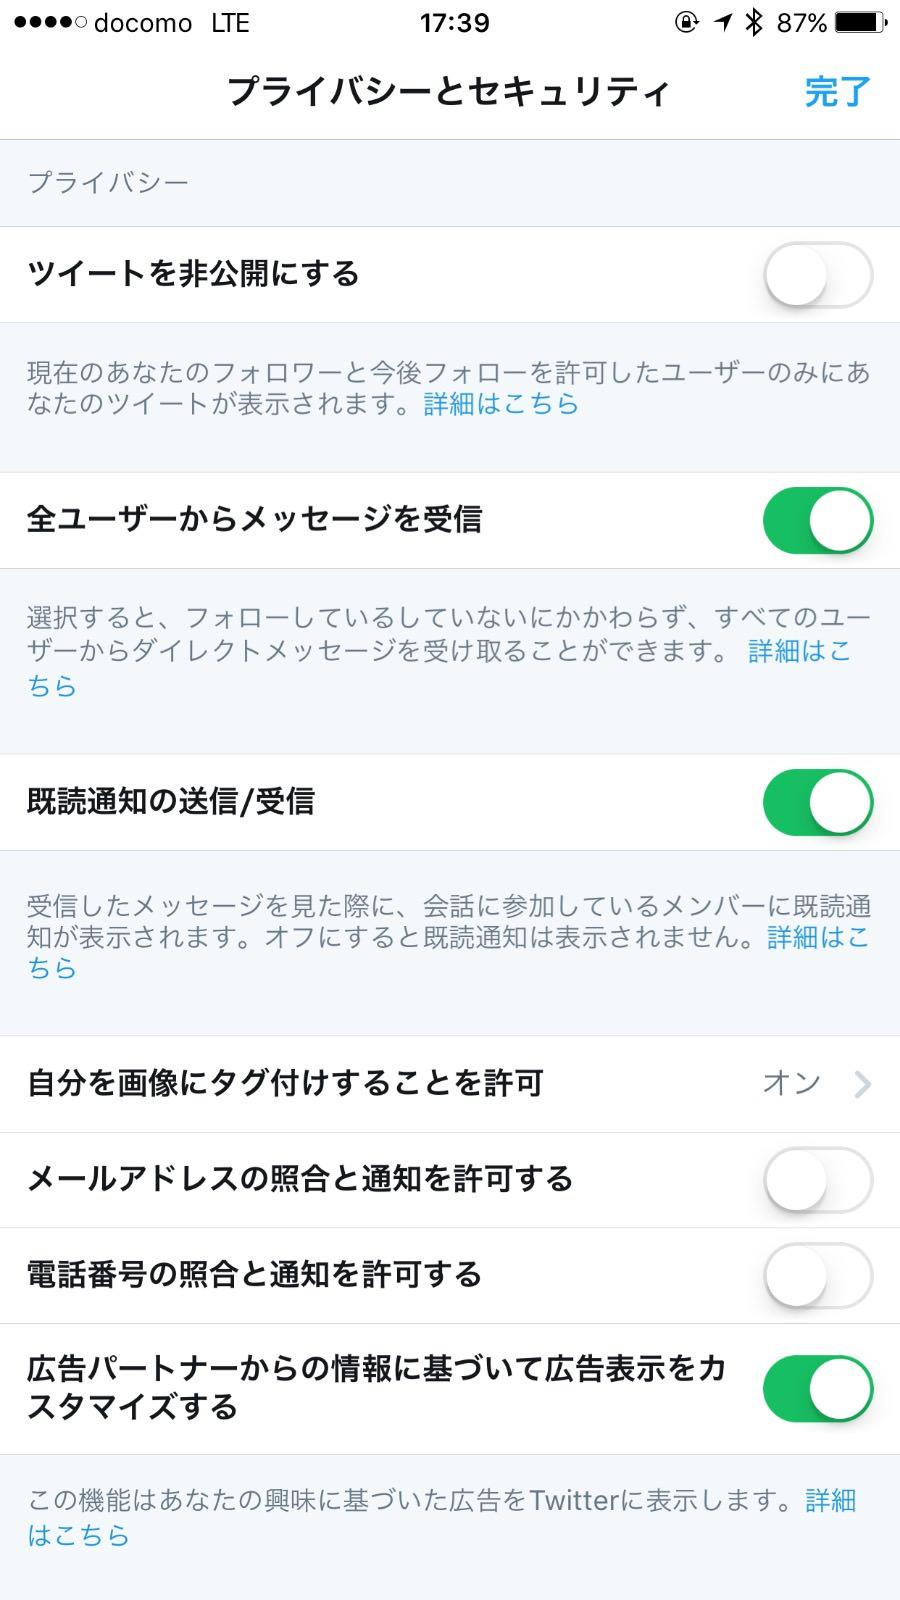 Twitter kidoku 8319